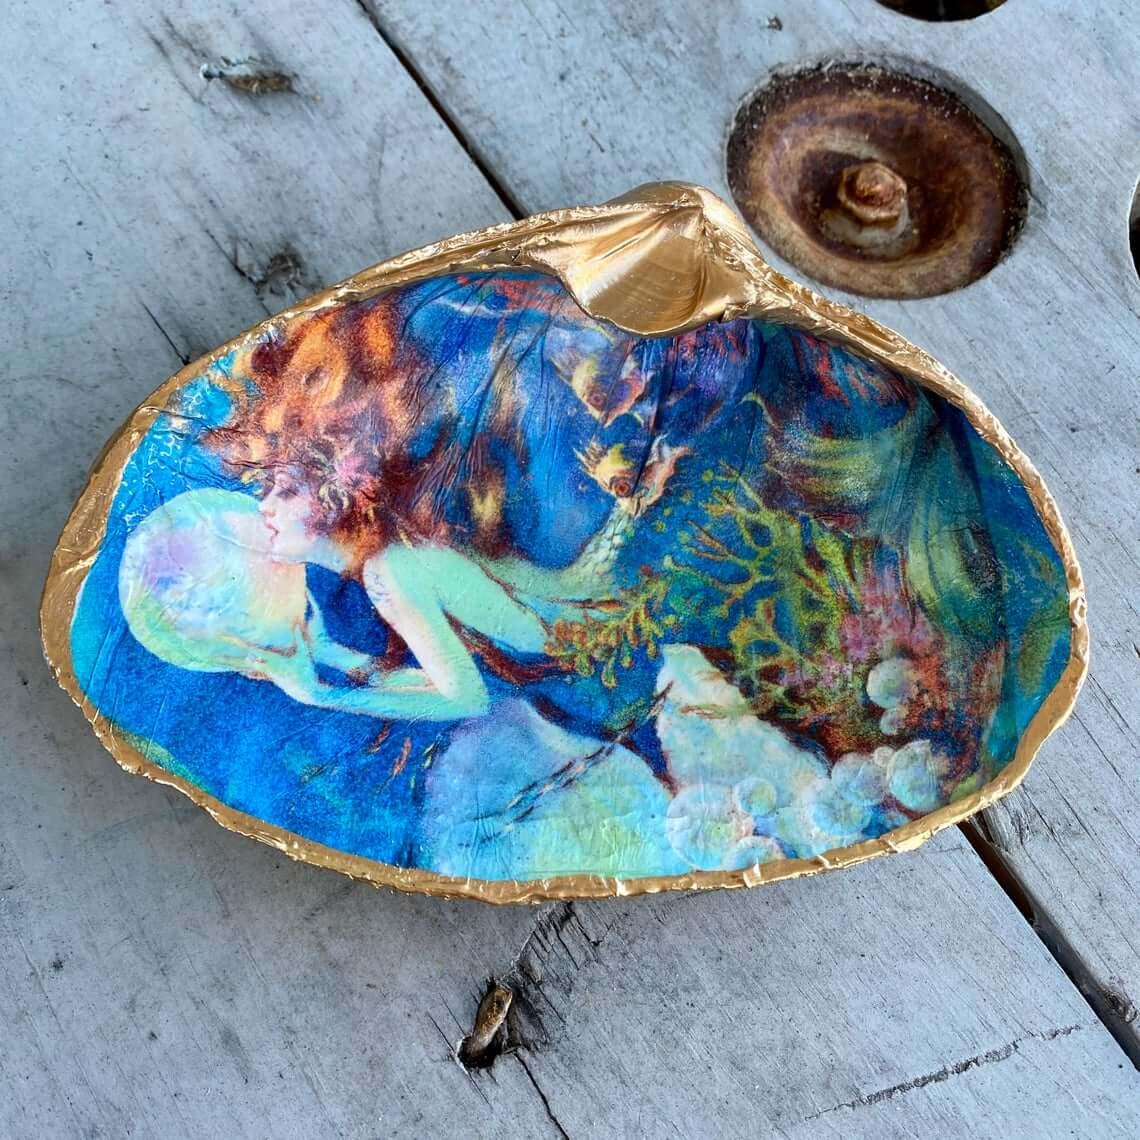 Amazing Mermaid Themed Shell Antiquity